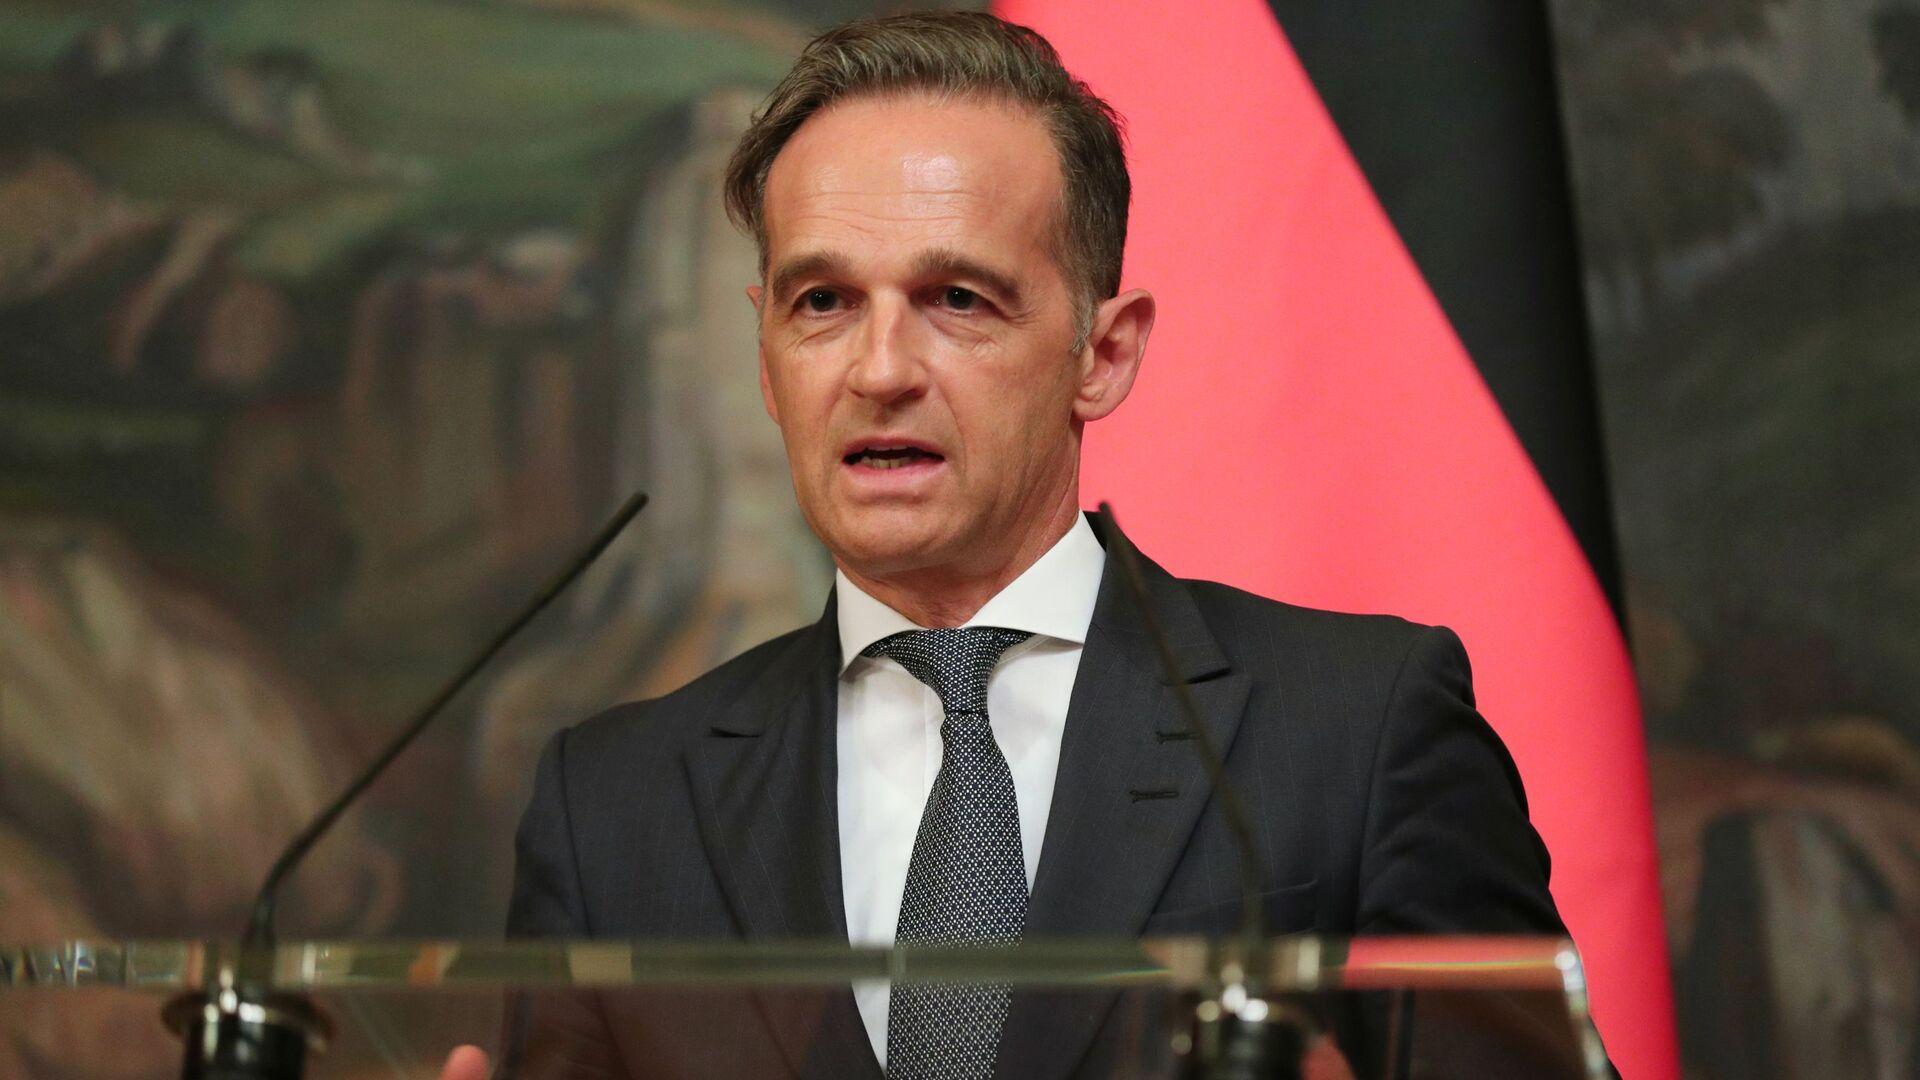 Heiko Maas, el ministro de Asuntos Exteriores alemán - Sputnik Mundo, 1920, 08.09.2021